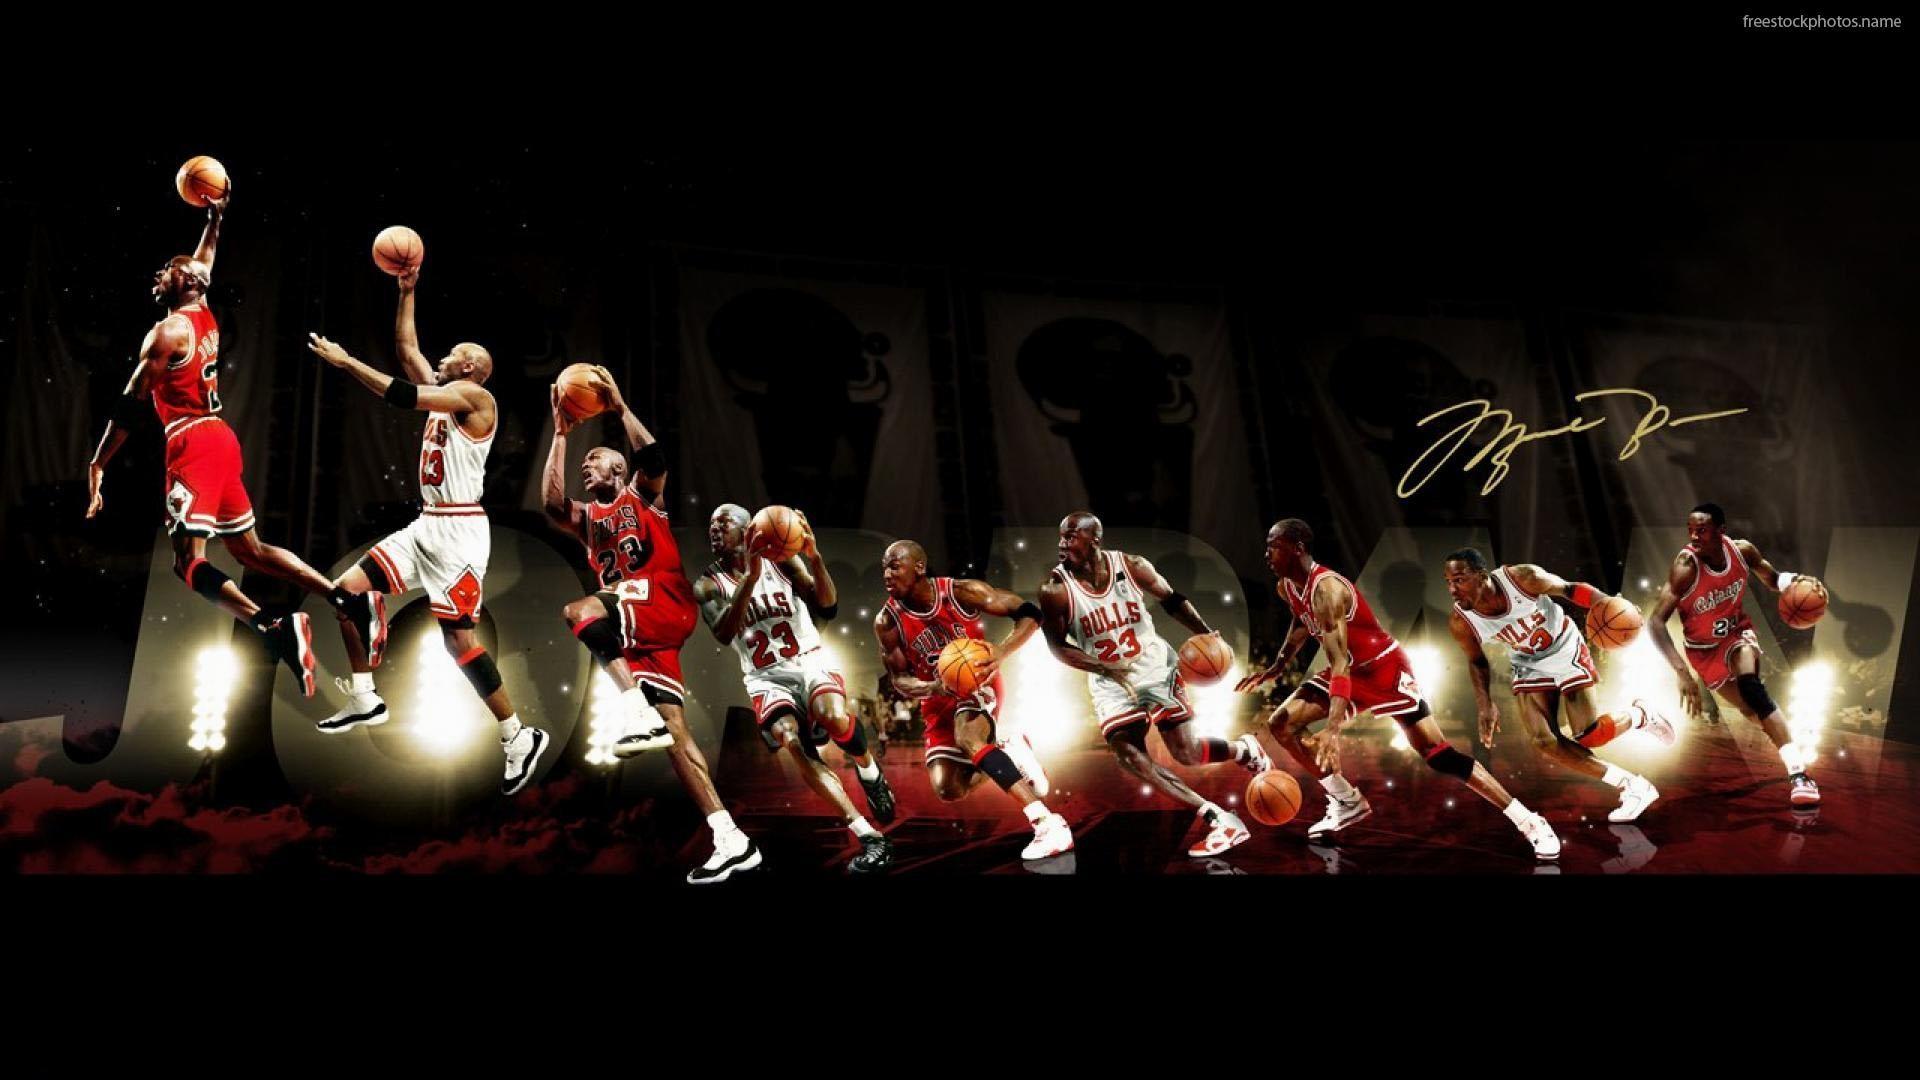 HD-Basketball-Best-HD-1920%C3%971080-Basketball-